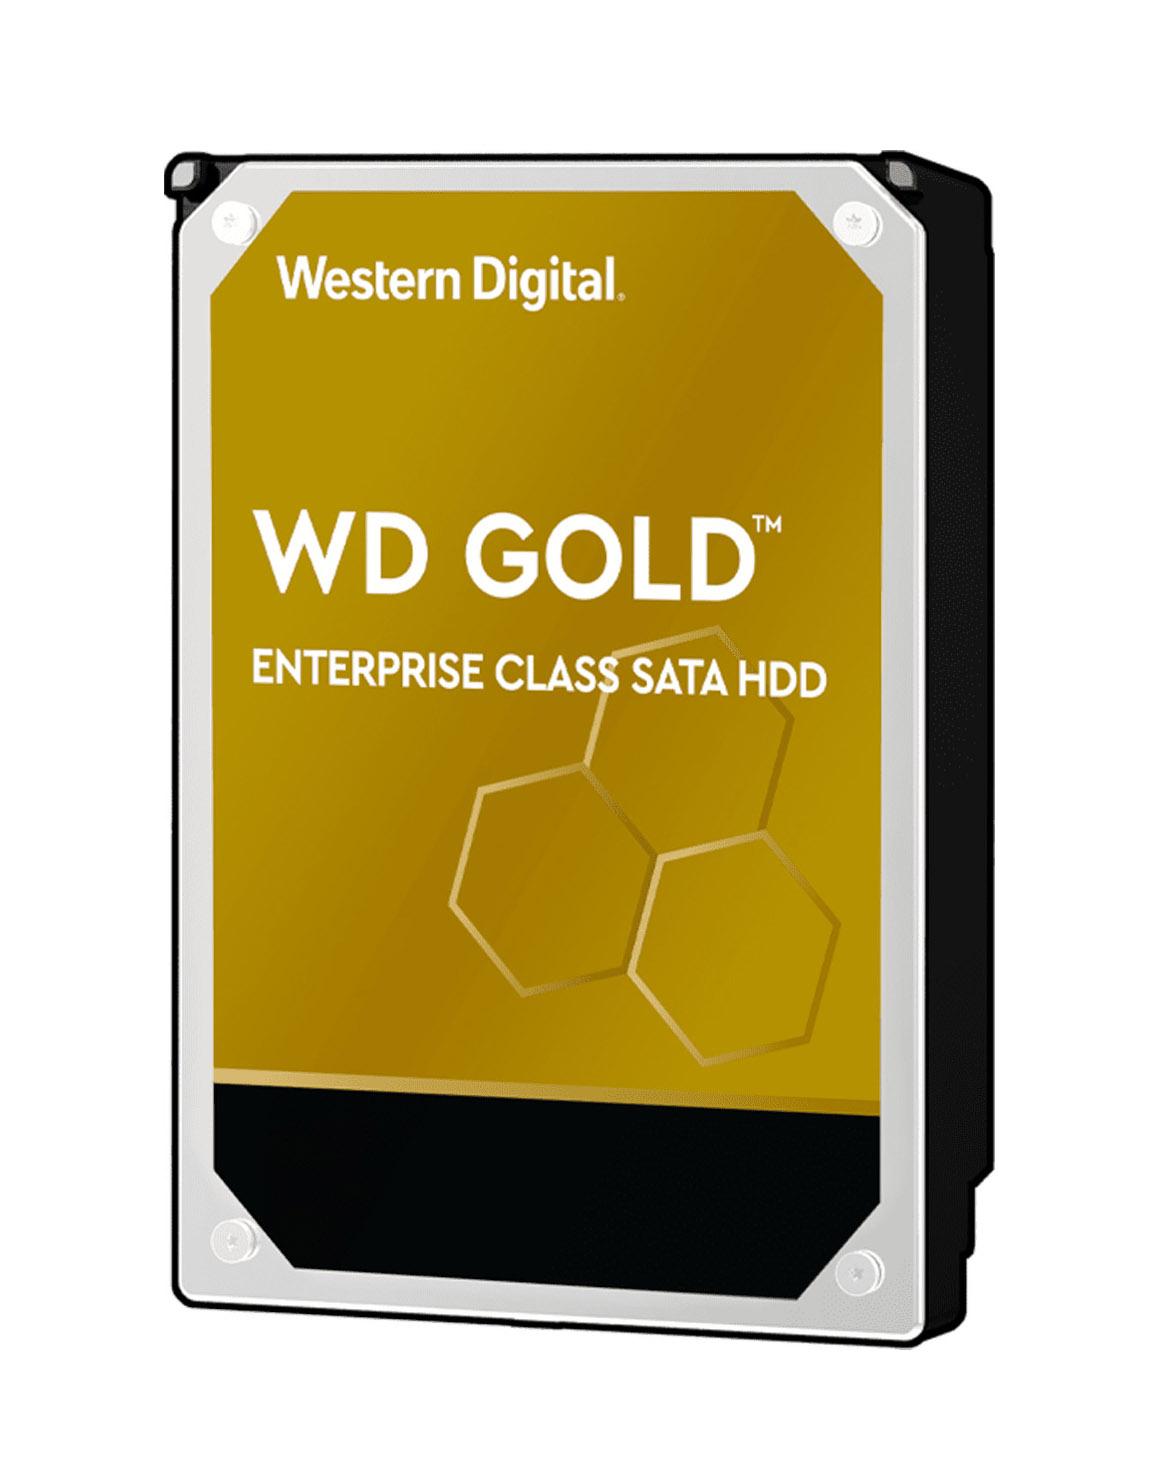 Western Digital Gold Enterprise 8TB WD8004FRYZ Σκληρός Δίσκος Sata 3